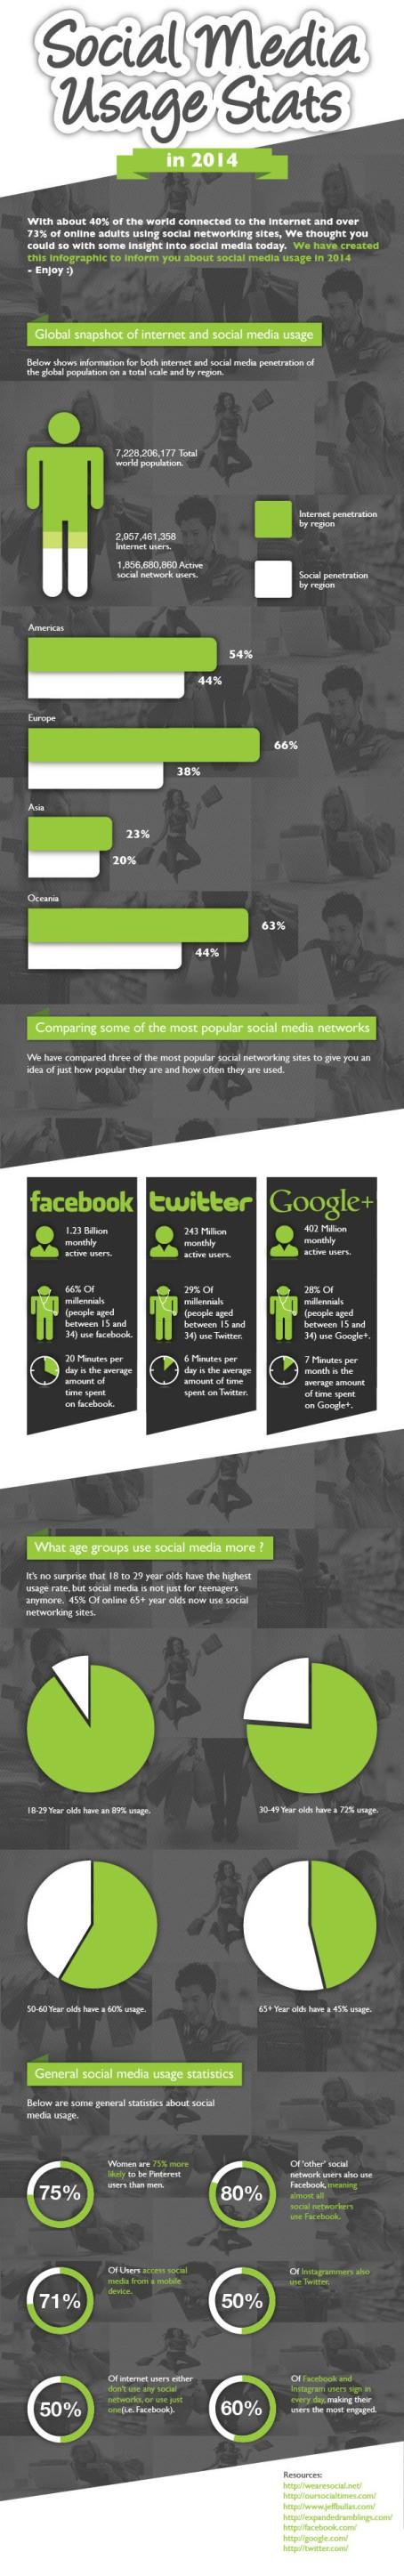 social media, social media usage, infographic